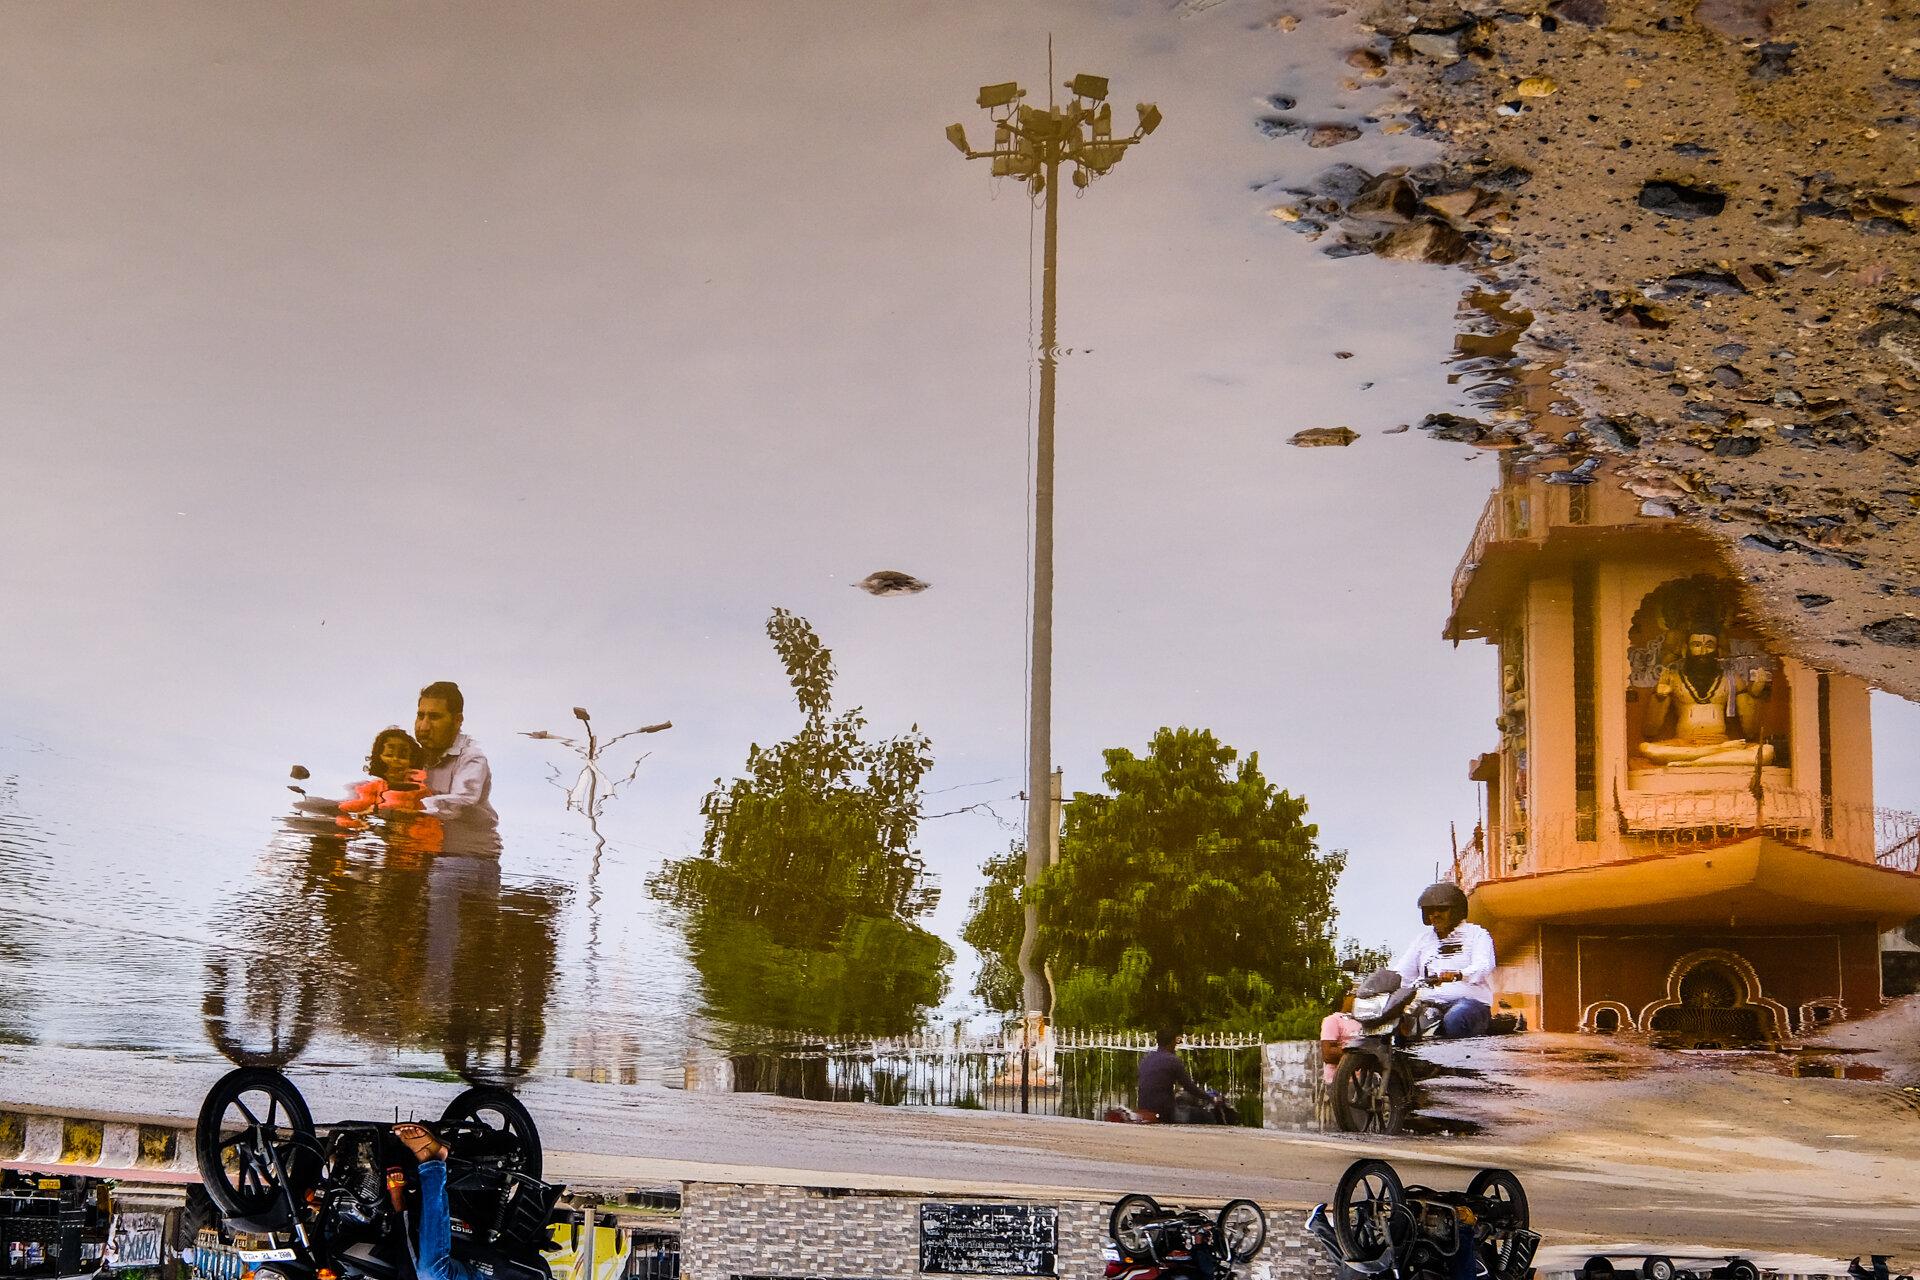 Pushkar Puddle. We brought rain to Pushkar